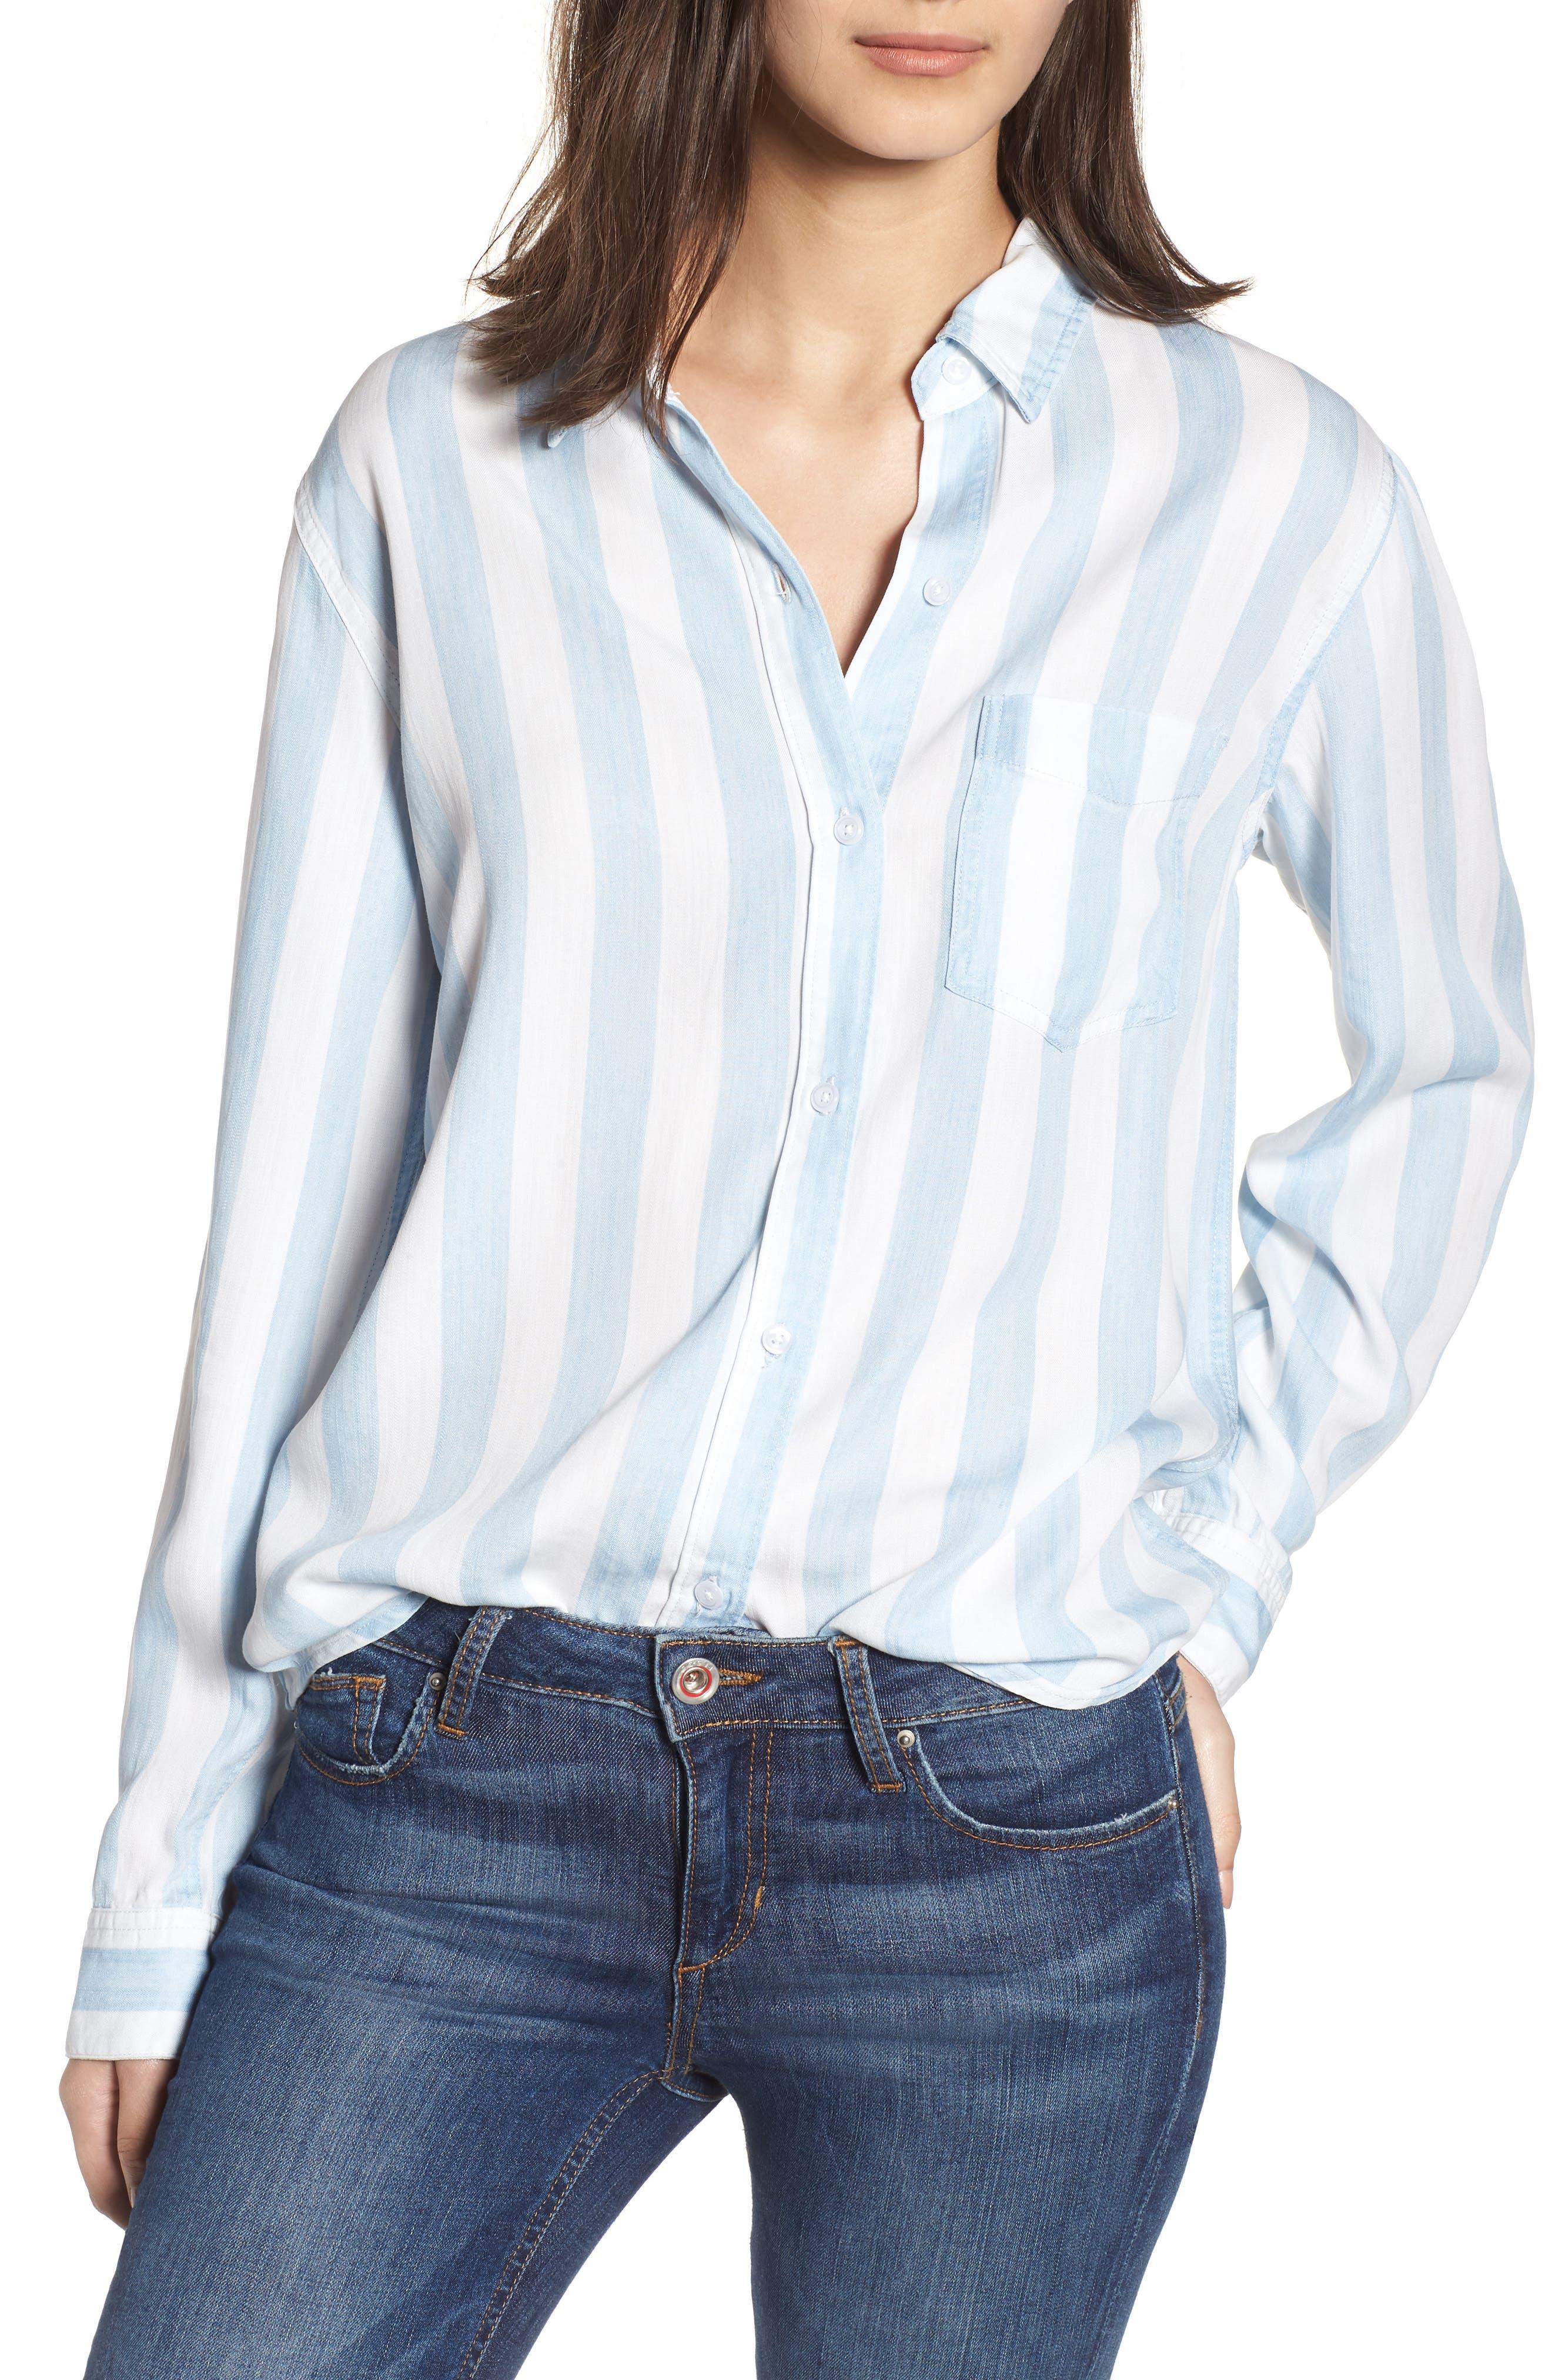 Ingrid Stripe Chambray Shirt,                             Main thumbnail 1, color,                             152